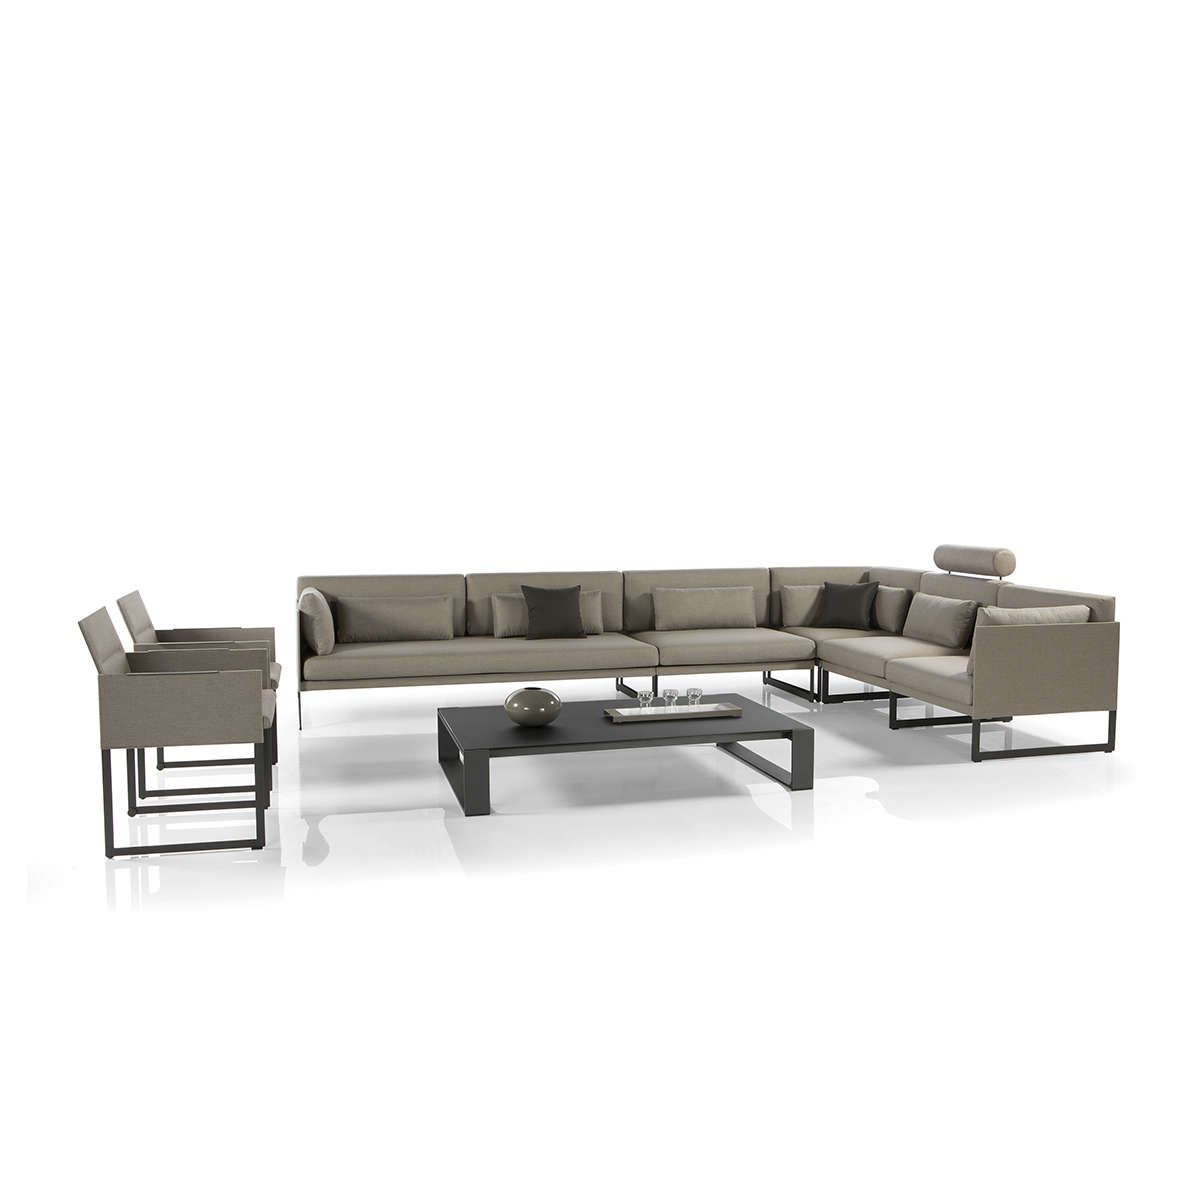 Squat Modular Sofa